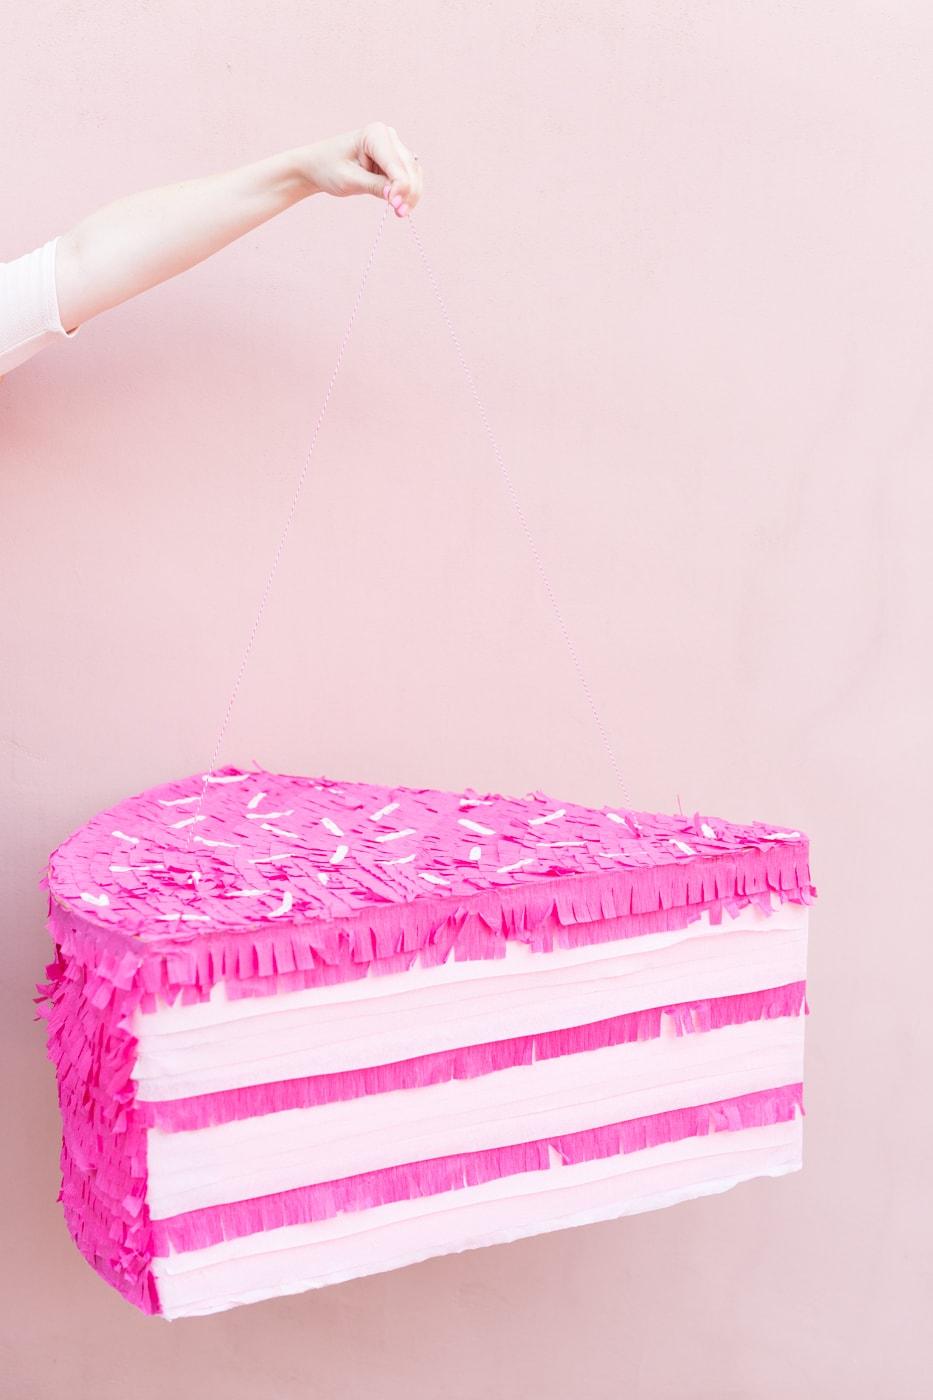 PINK-CAKE-SLICE-PINATA